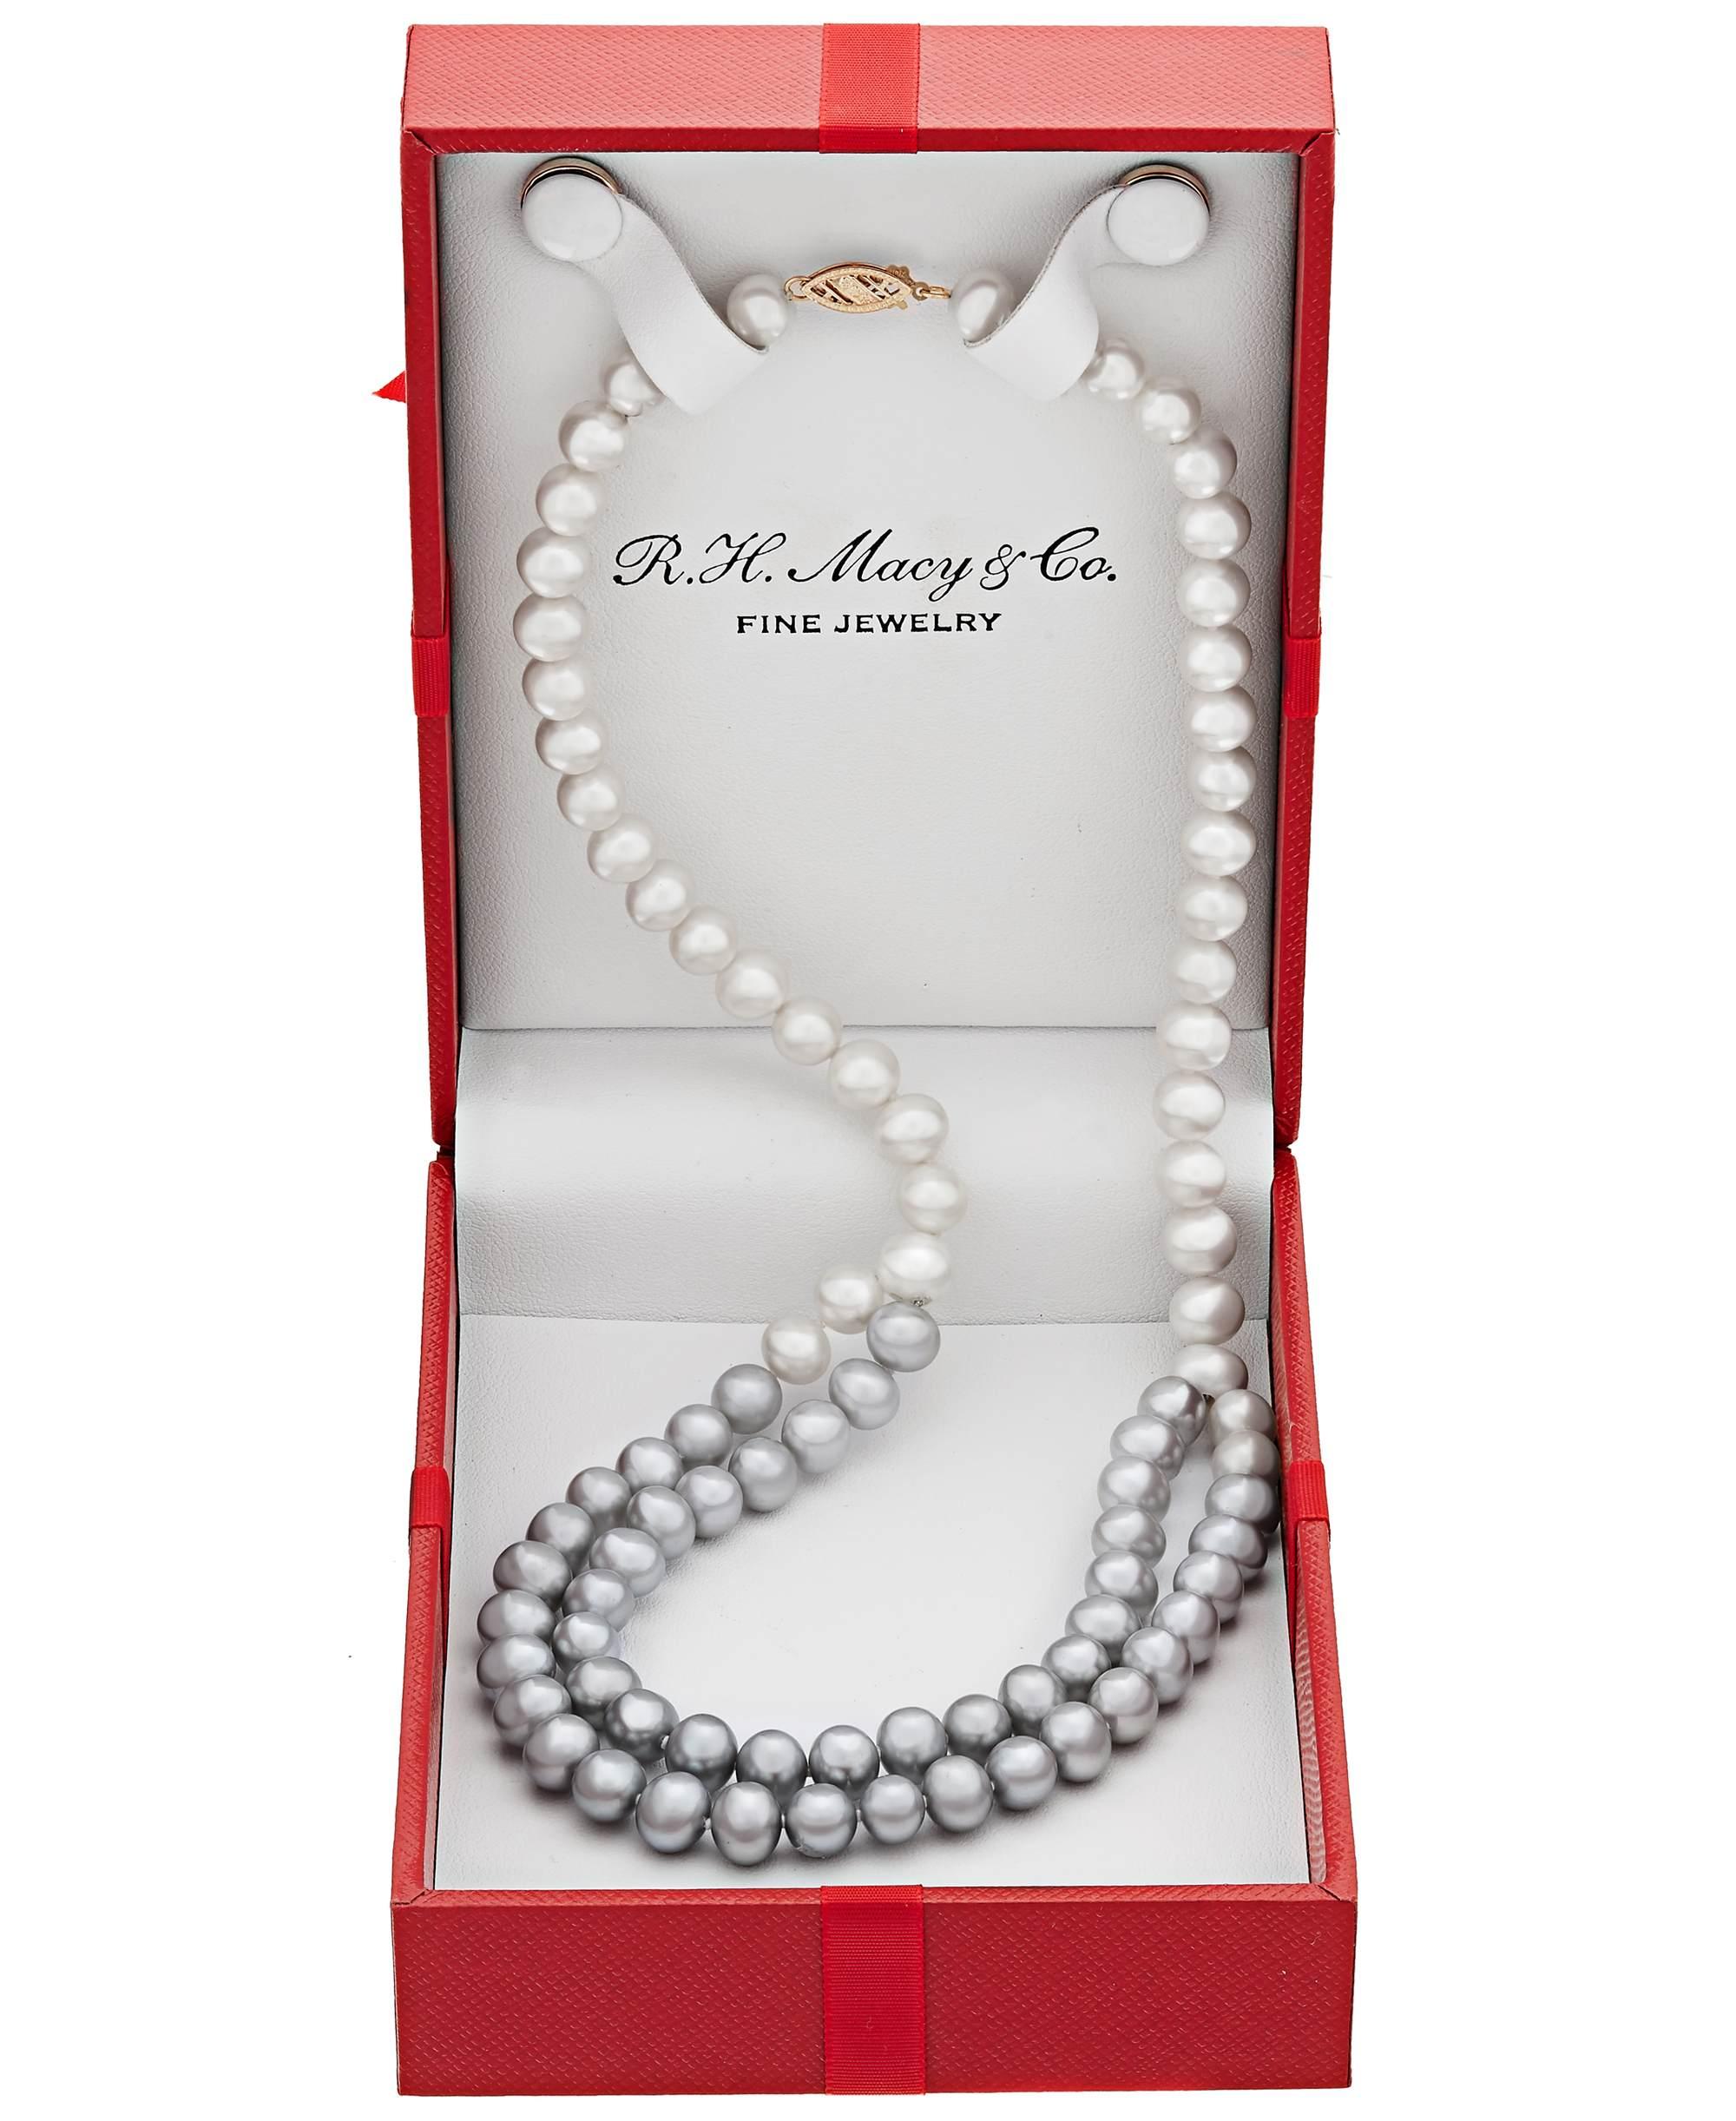 macys_pearls_productphotography.jpg